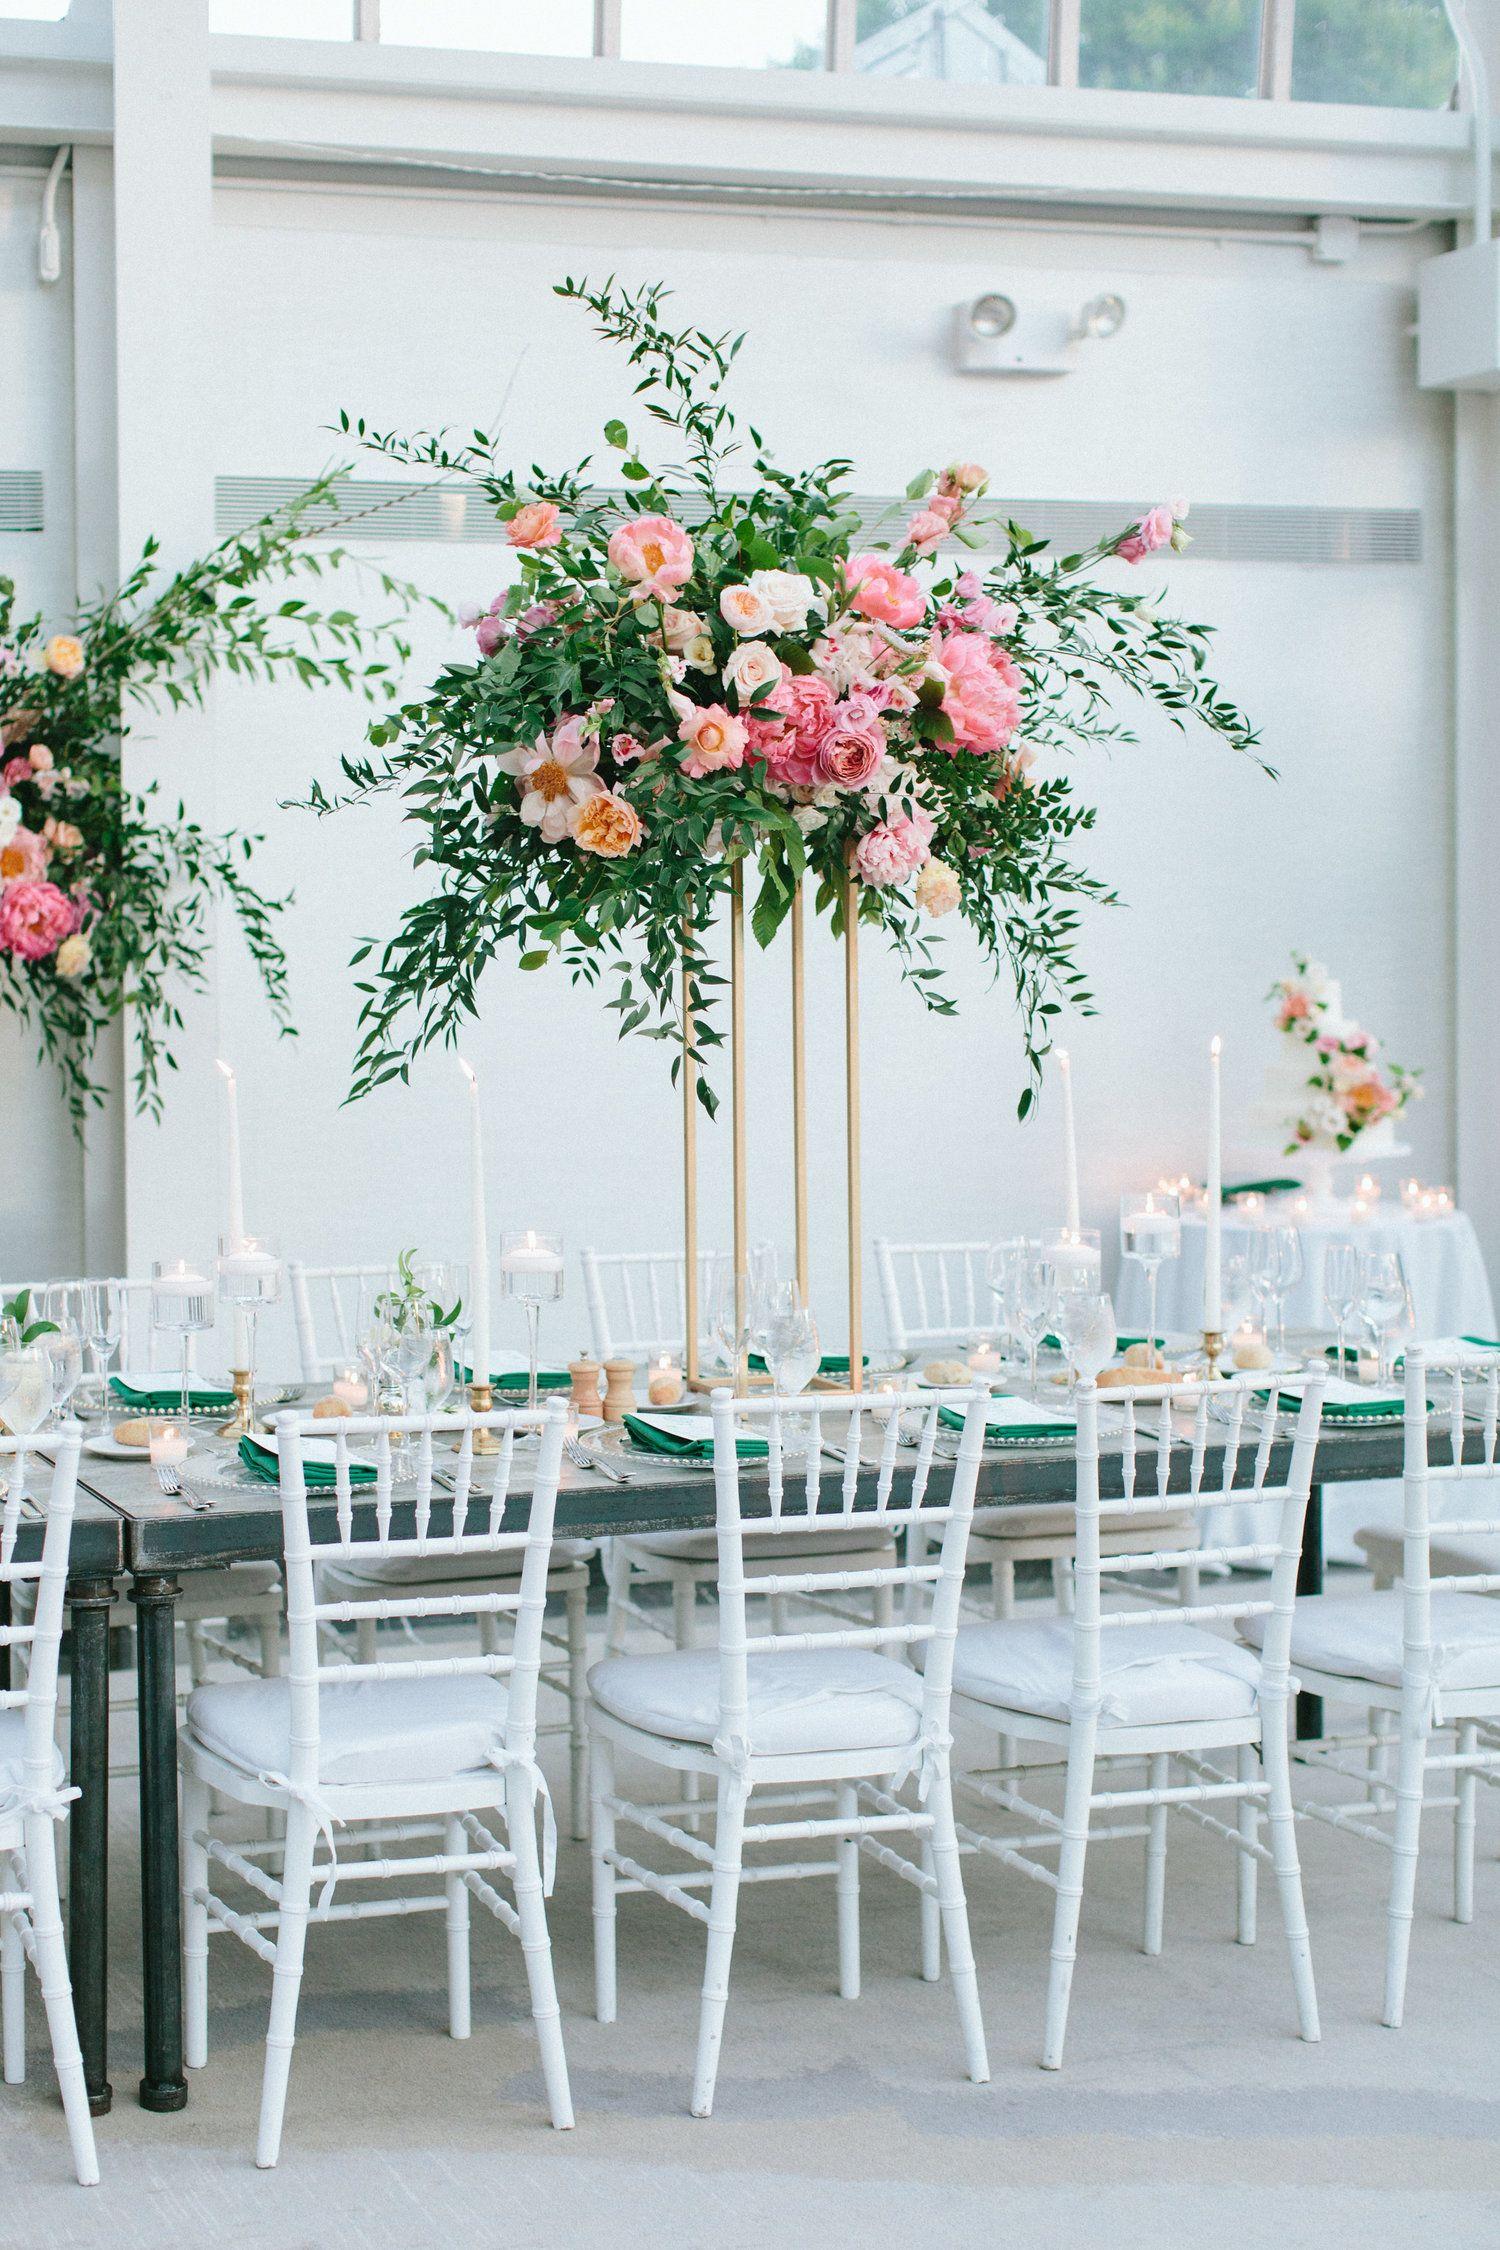 Organic Greenery Shades Of Pink Tall Centerpiece Photo By Sasithon Photograph Flower Centerpieces Wedding Wedding Table Centerpieces Wedding Centerpieces